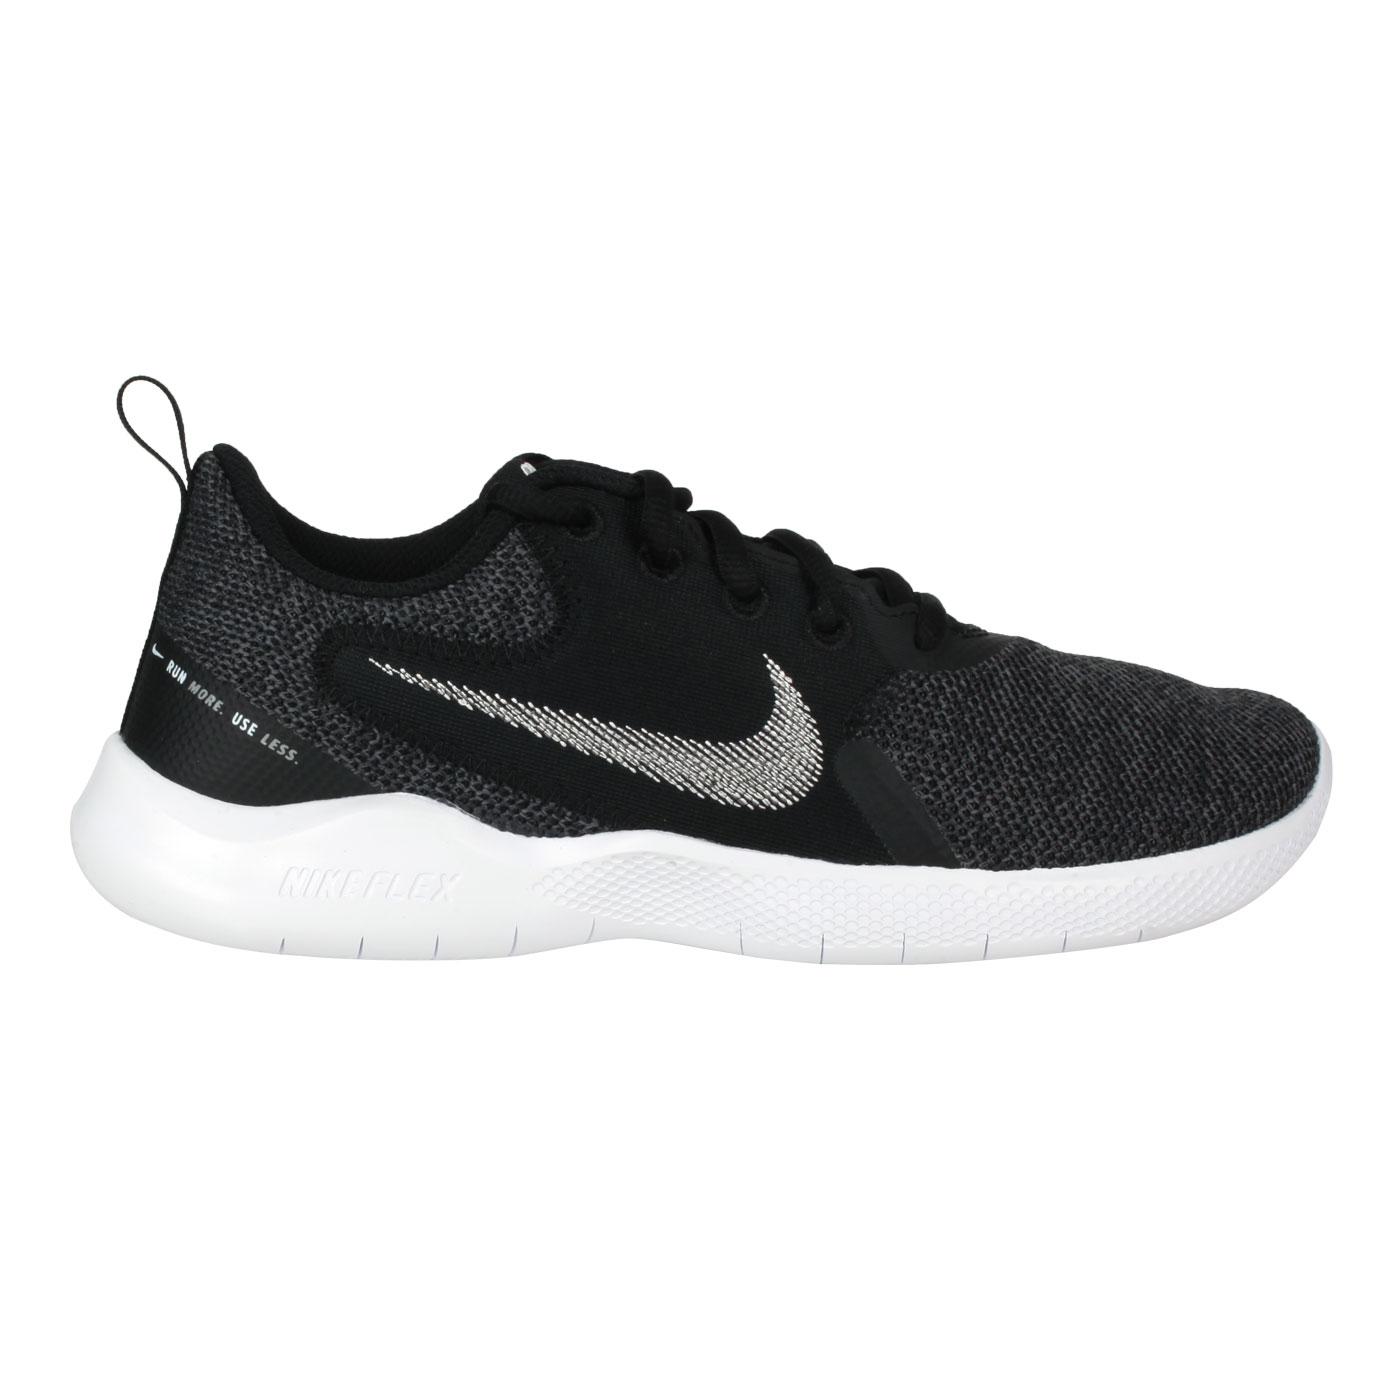 NIKE 女款休閒慢跑鞋  @WMNS FLEX EXPERIENCE RN 10@CI9964002 - 黑白灰